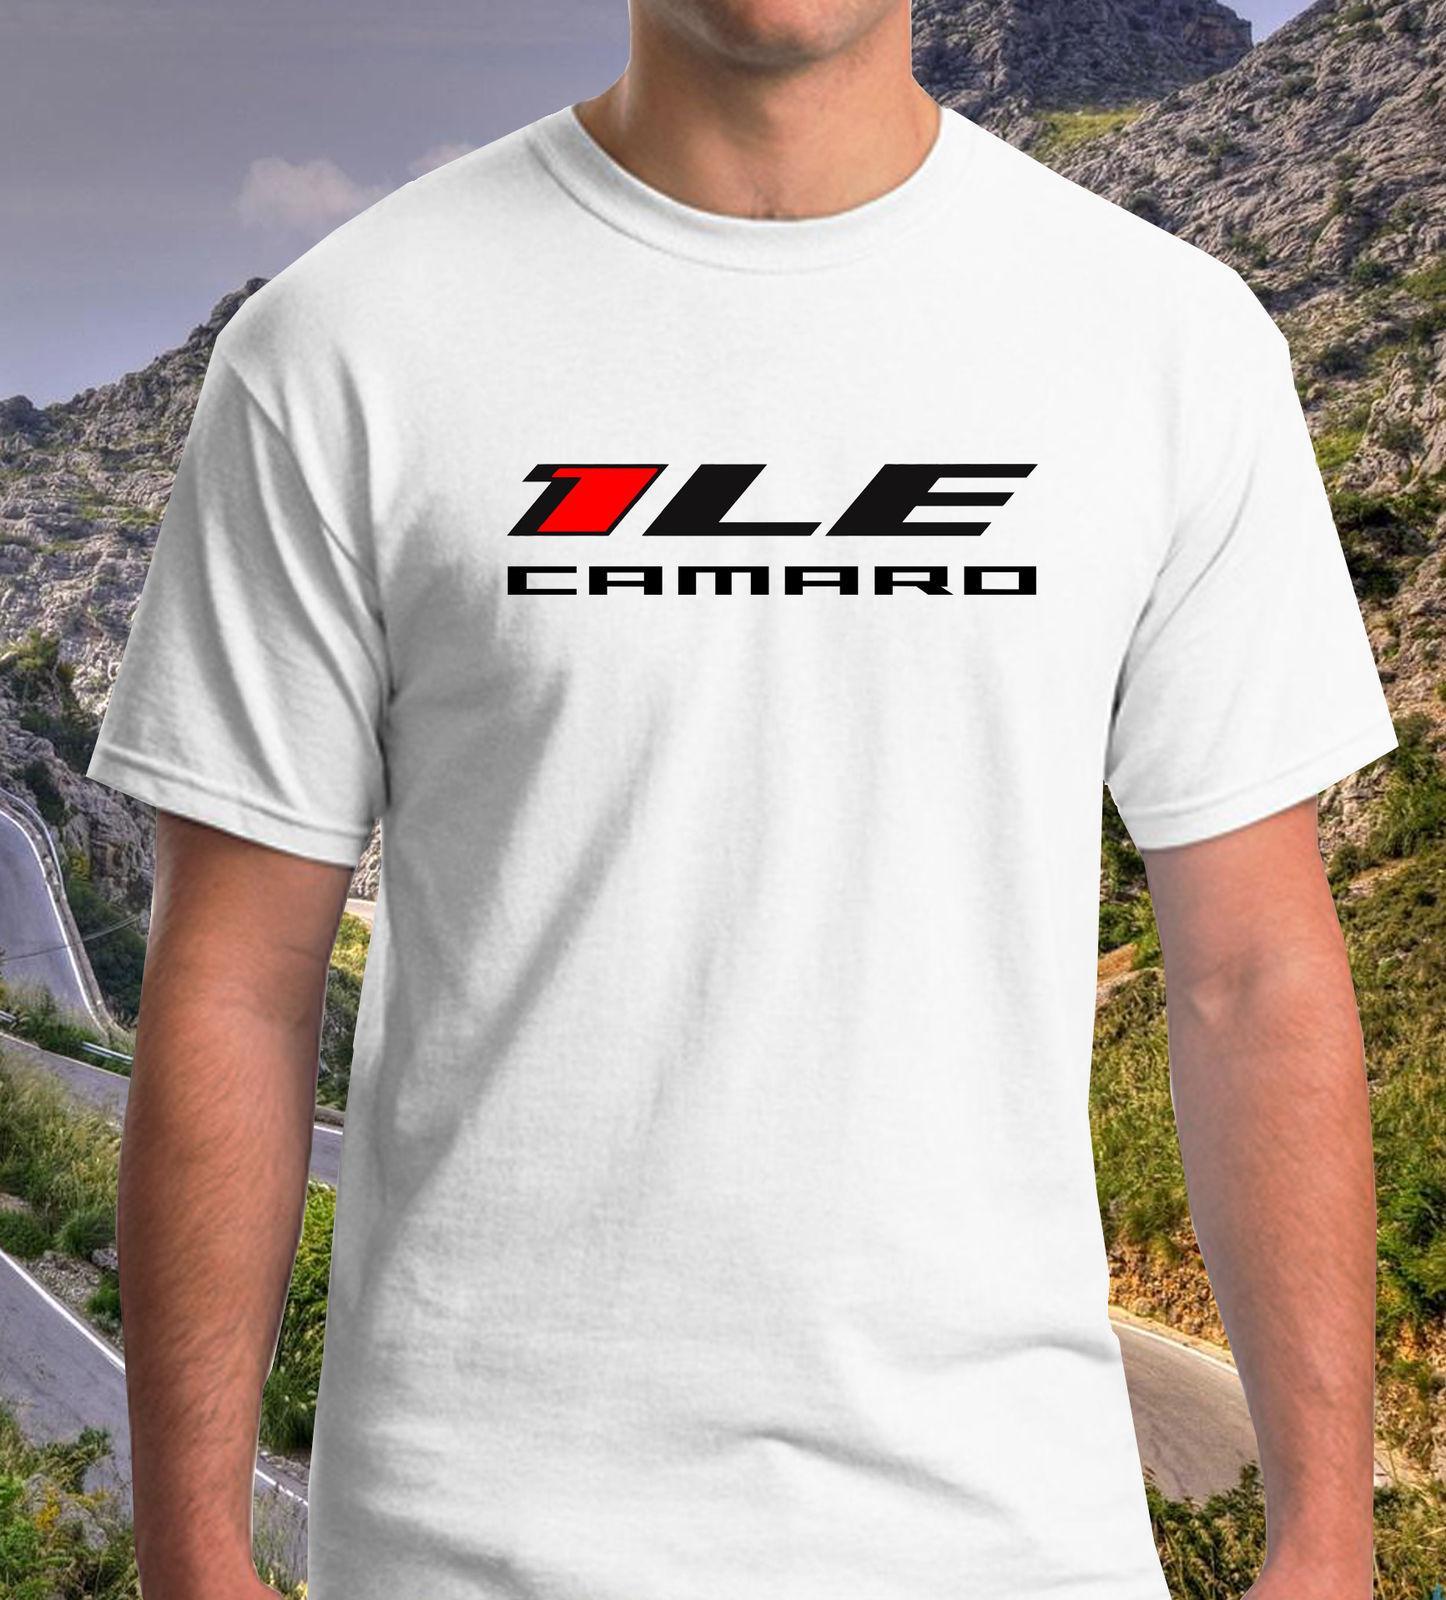 53e17ad1 Chevy Camaro 1LE Chevrolet 1 LE T-shirts Men's White Tee Size S to 3XL